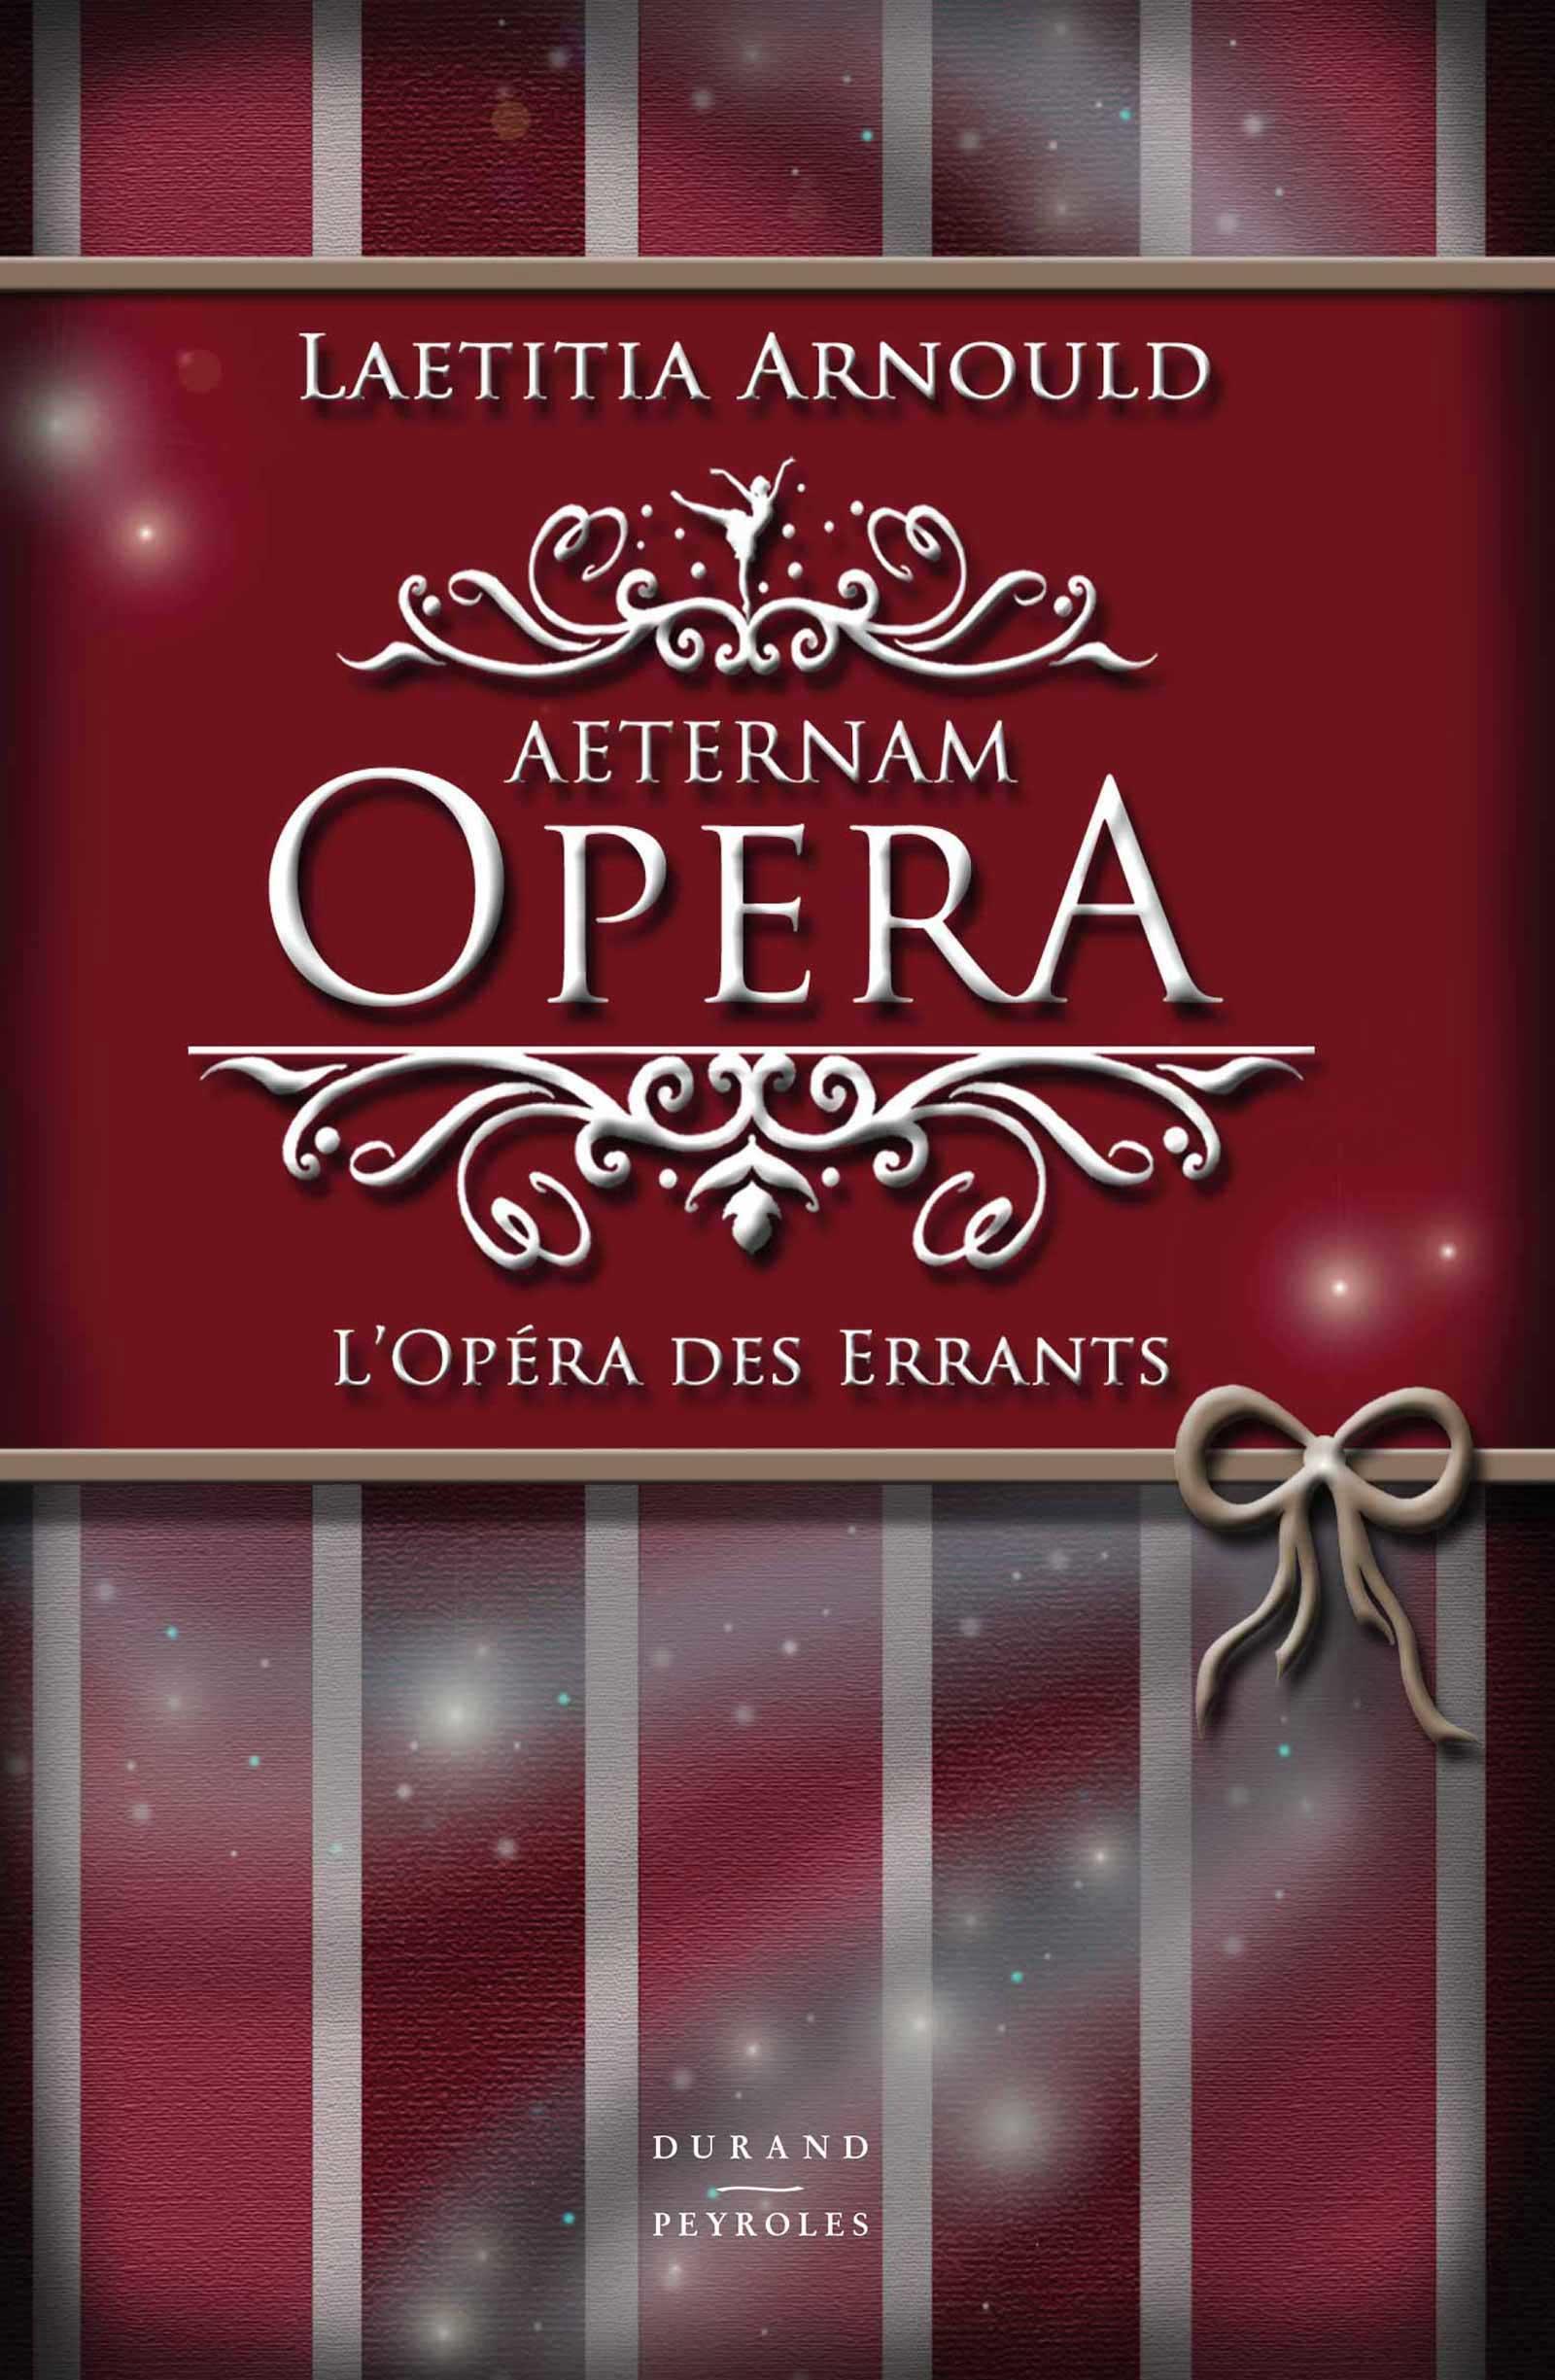 Aeternam Opera, L'OPÉRA DES ERRANTS